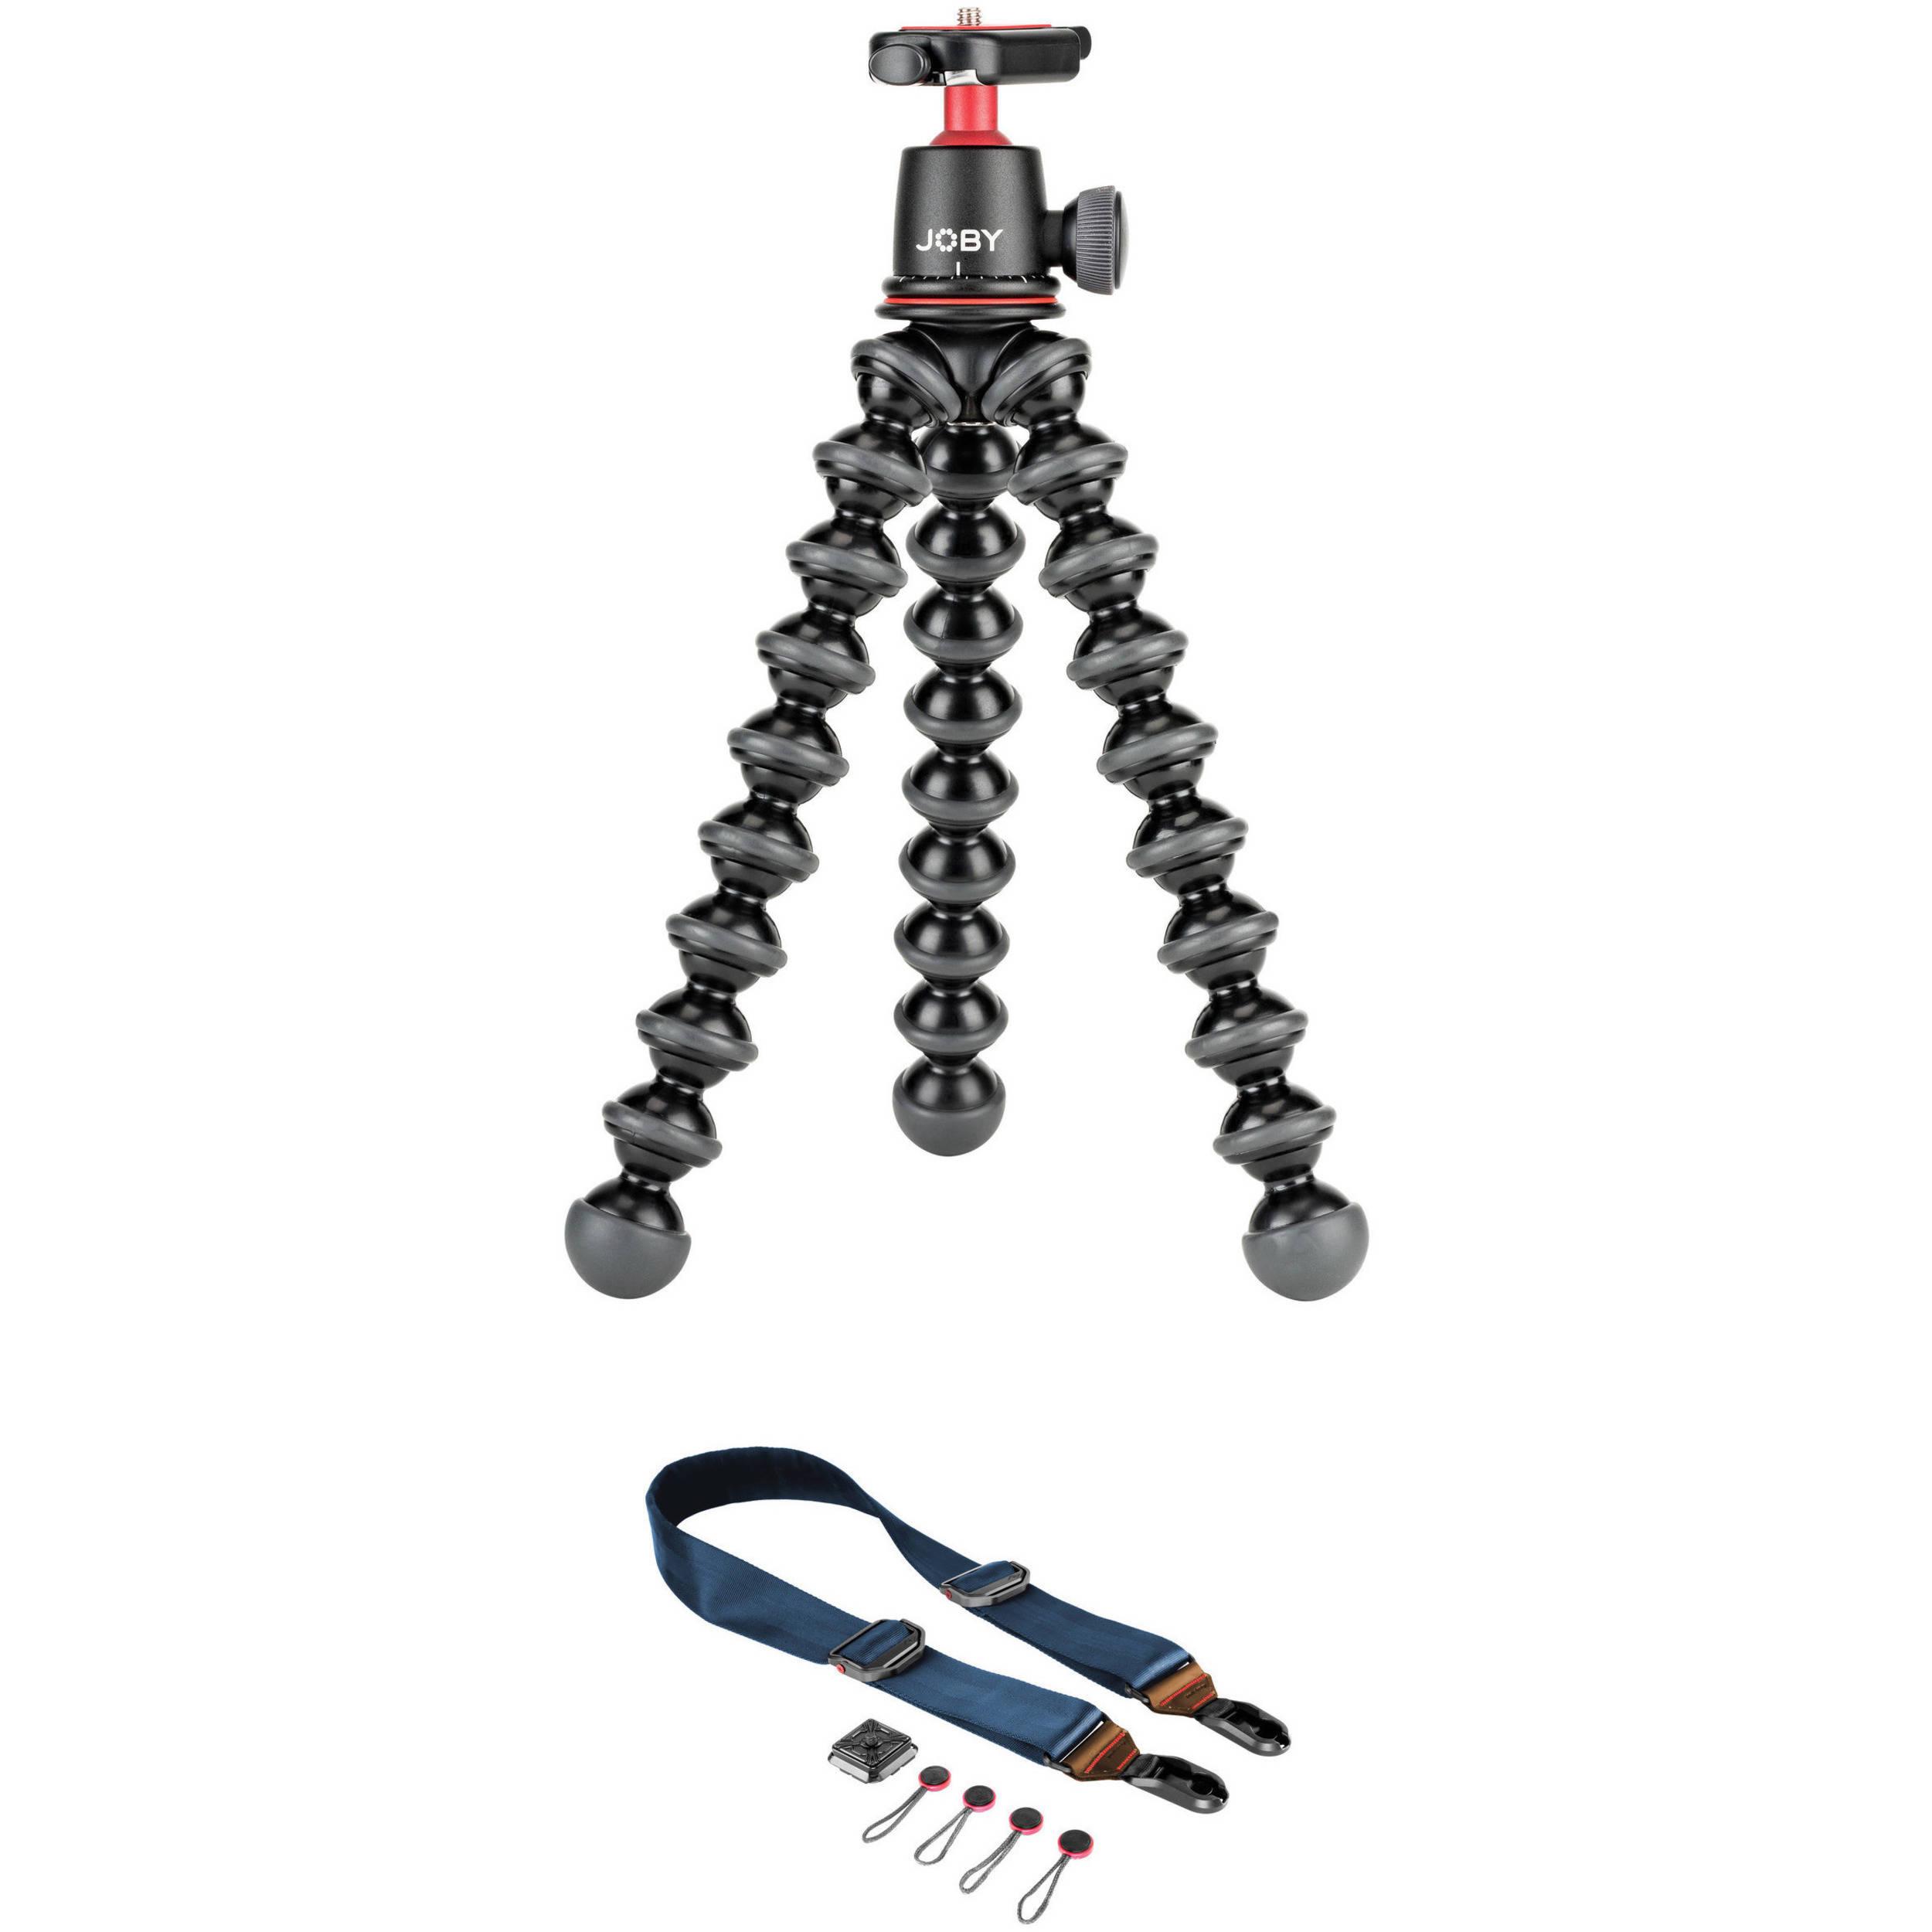 Joby Gorillapod 3K + Slide SL-2 Camera Strap for $79.95 at